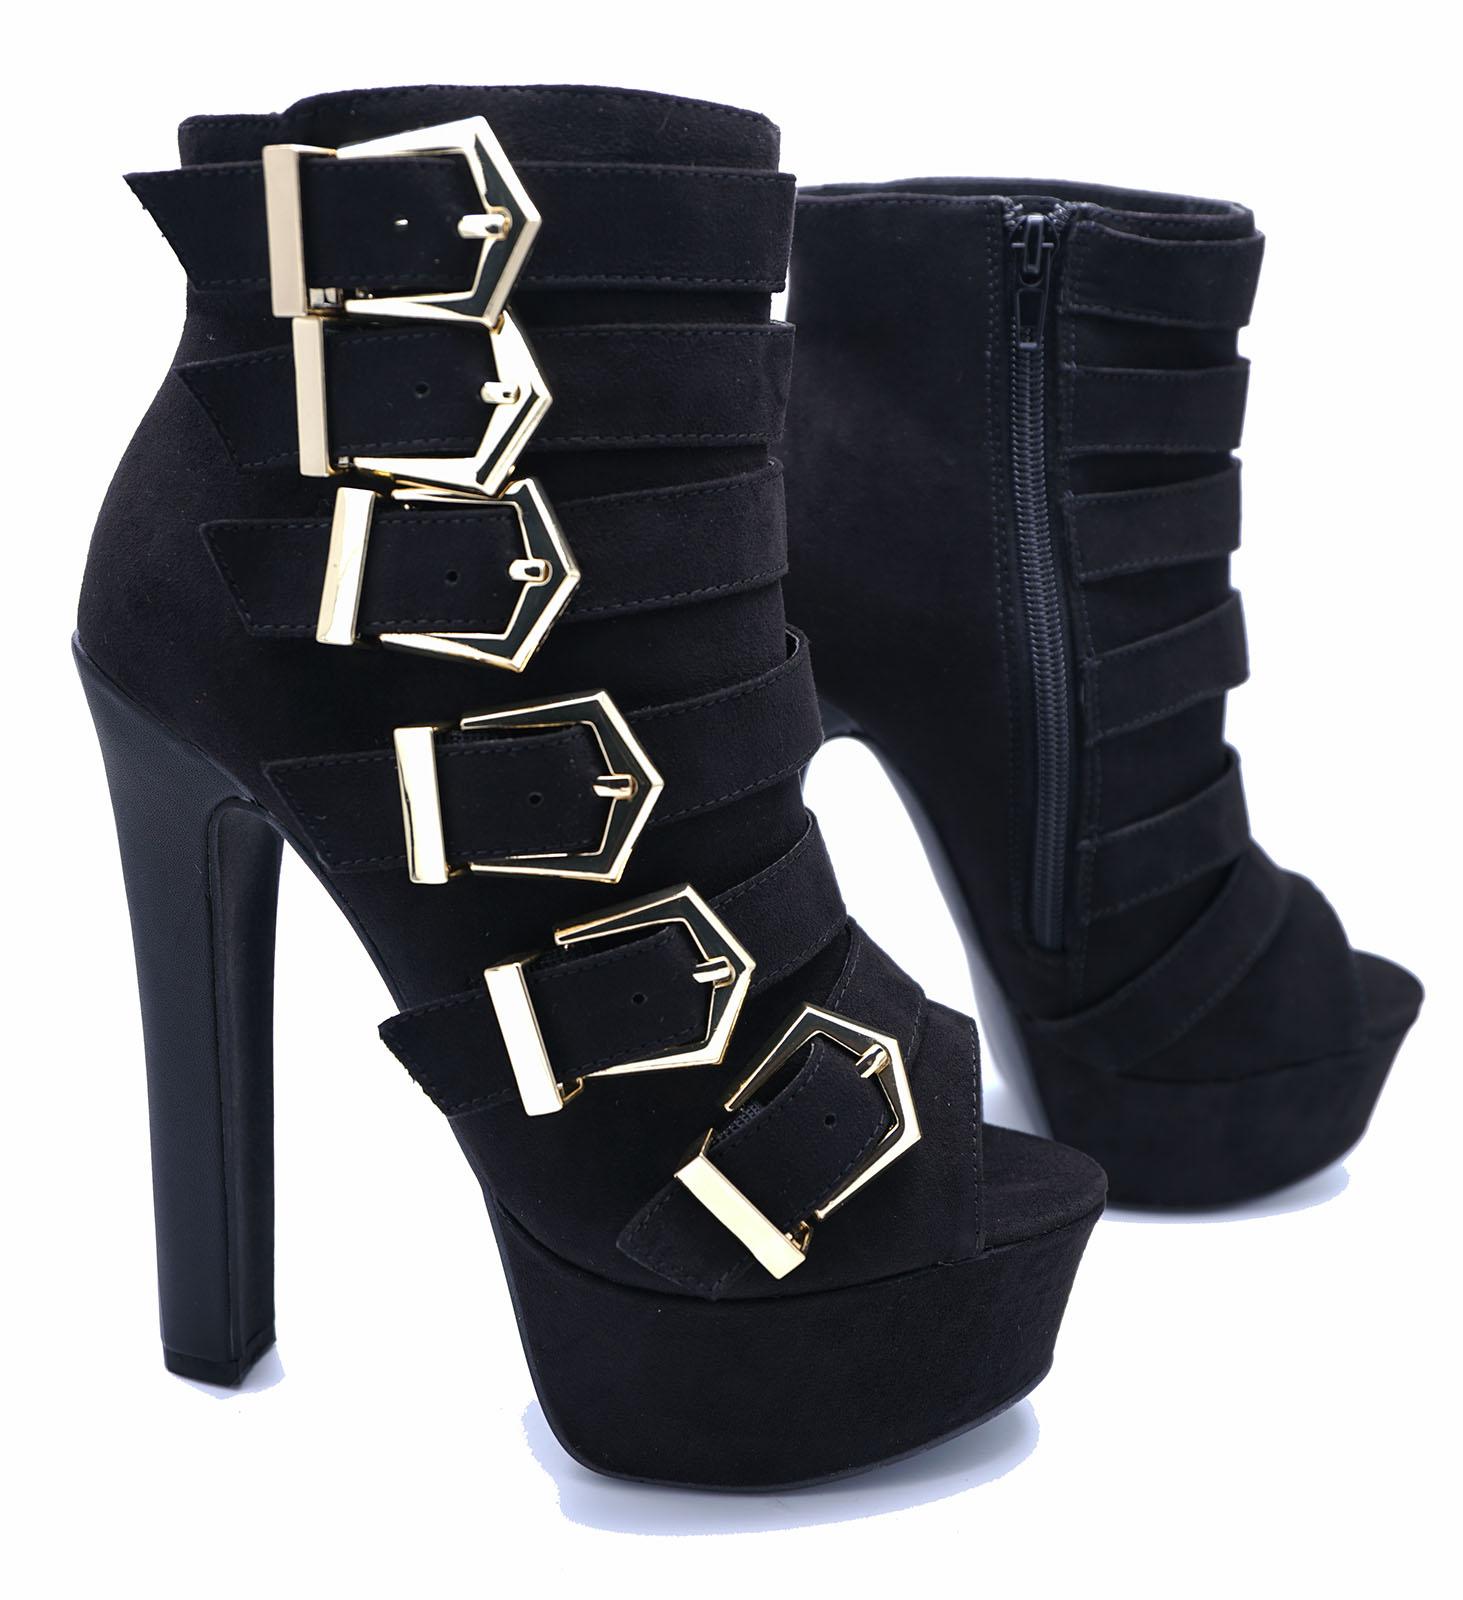 LADIES-BLACK-ZIP-UP-PLATFORM-PEEP-TOE-BUCKLE-ANKLE-CALF-HIGH-HEEL-BOOTS-SIZES-3 thumbnail 22